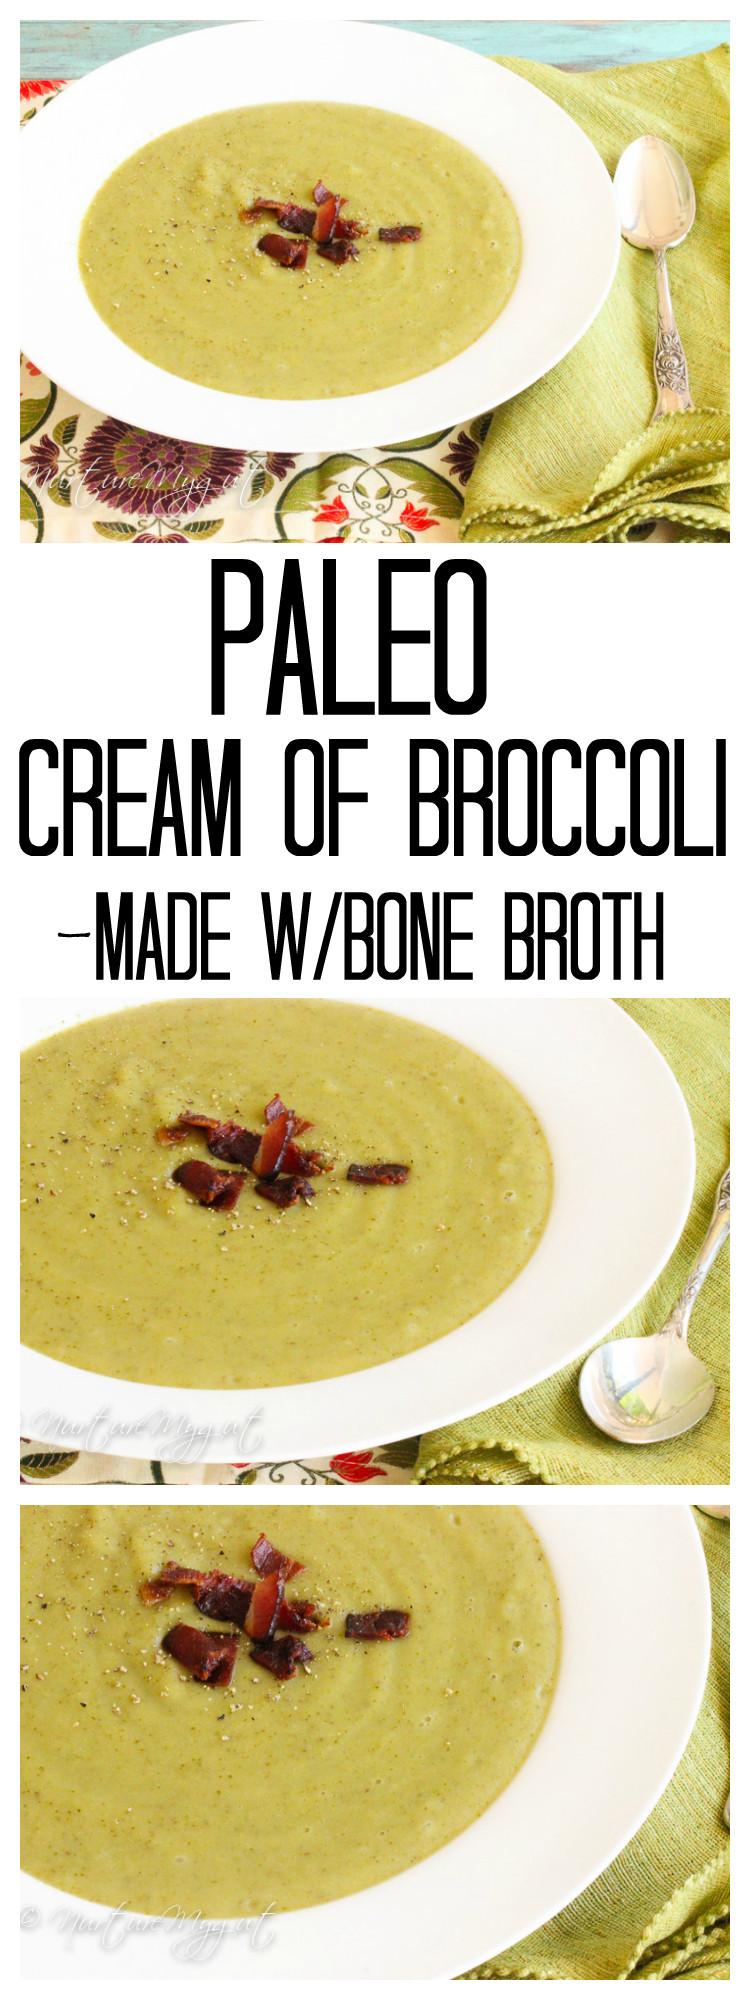 Paleo Broccoli Soup  Paleo Cream of Broccoli Soup